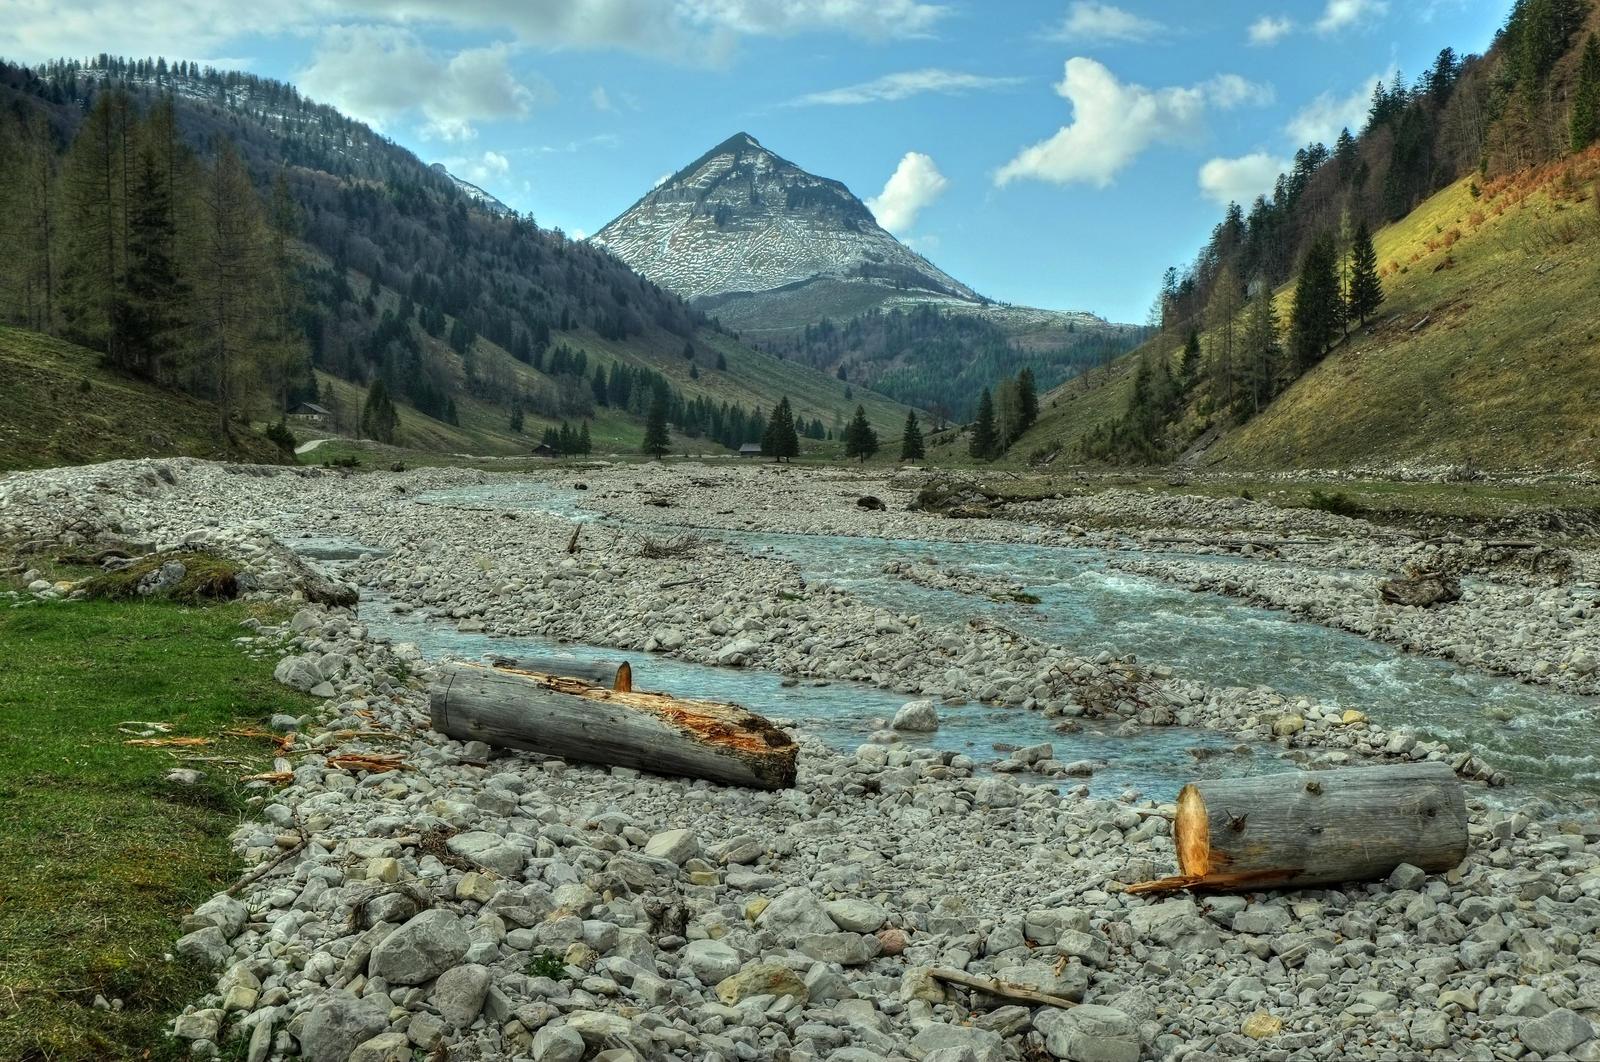 Mountain Riverscape by Burtn